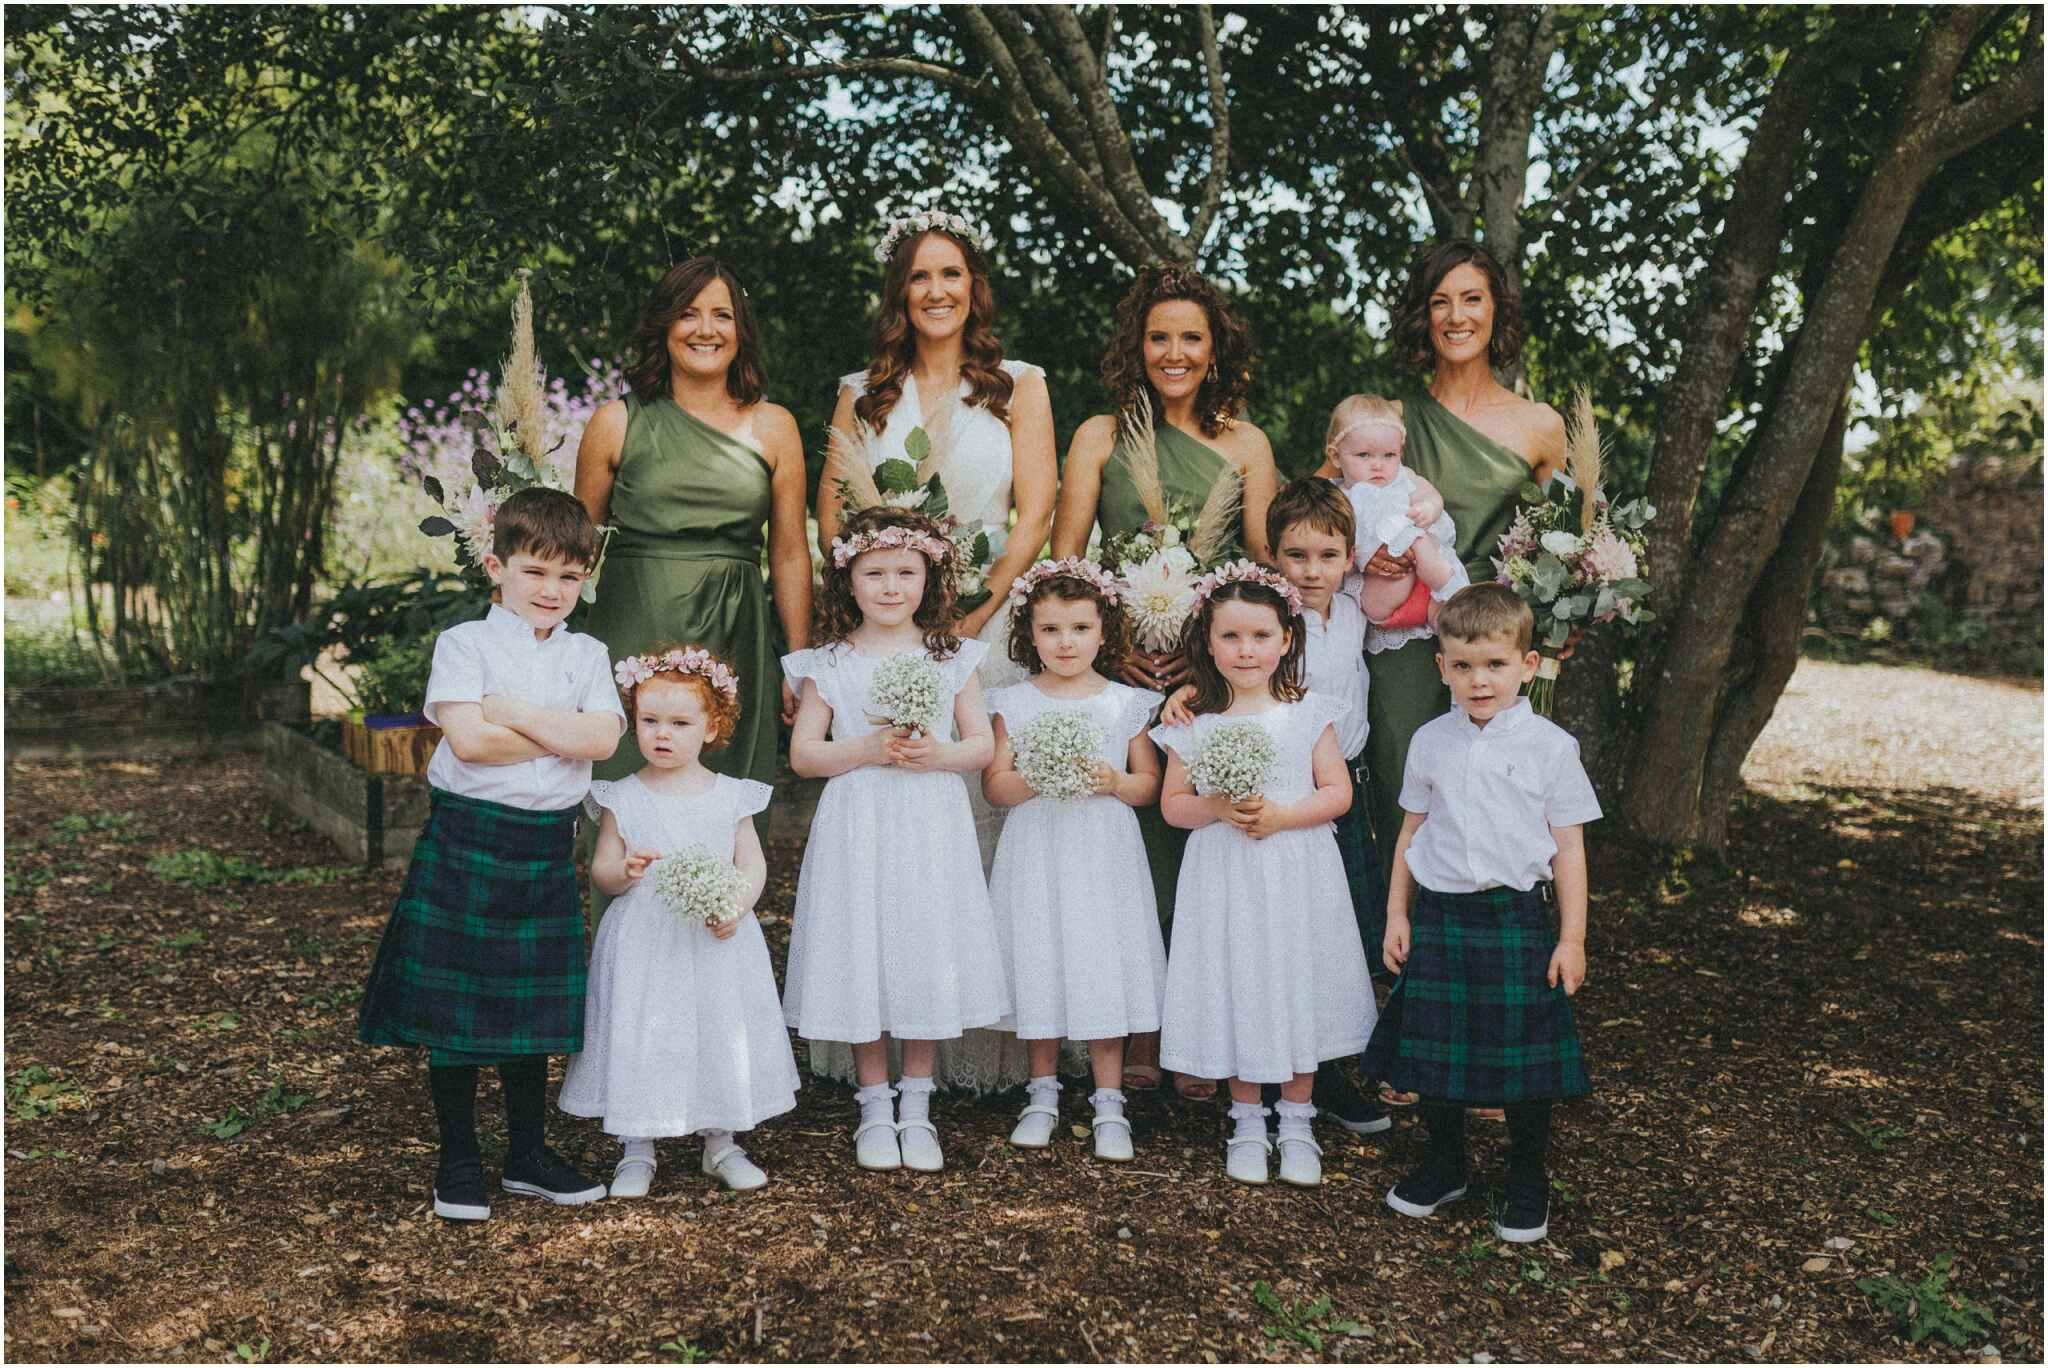 Fionnuala + Paul - Mount Druid Alternative Wedding 59